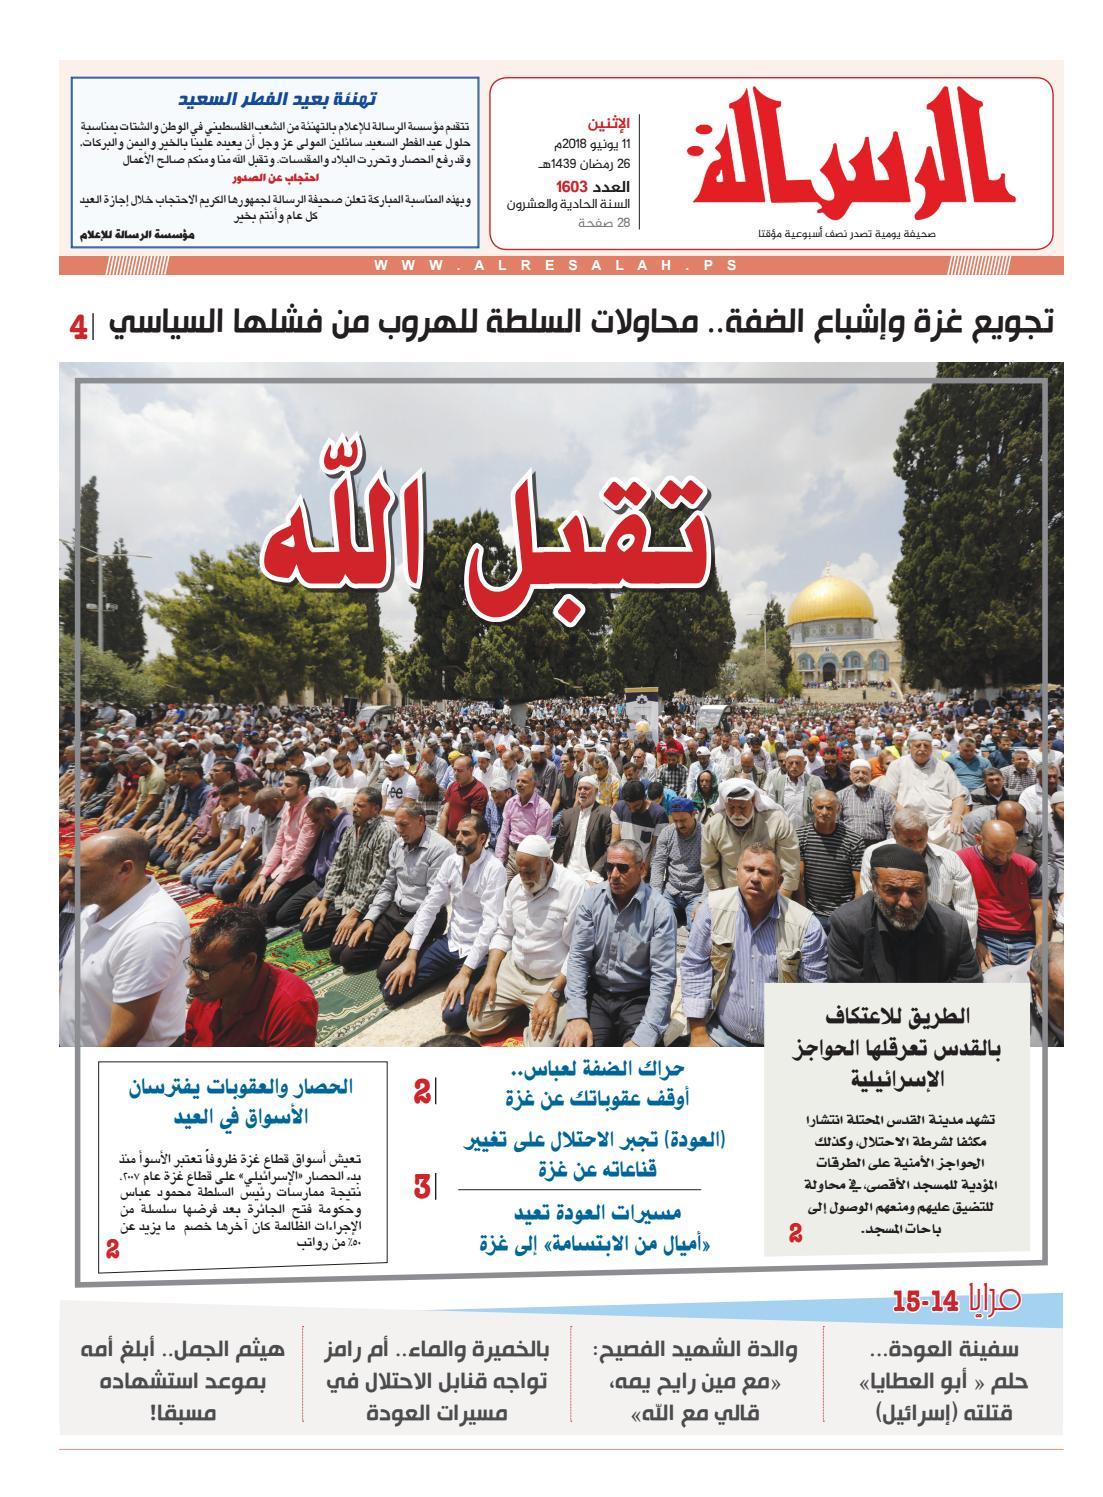 b848609e6467a صحيفة الرسالة والعدد ١٦٠٣ ليوم الاثنين by صحيفة الرسالة - issuu